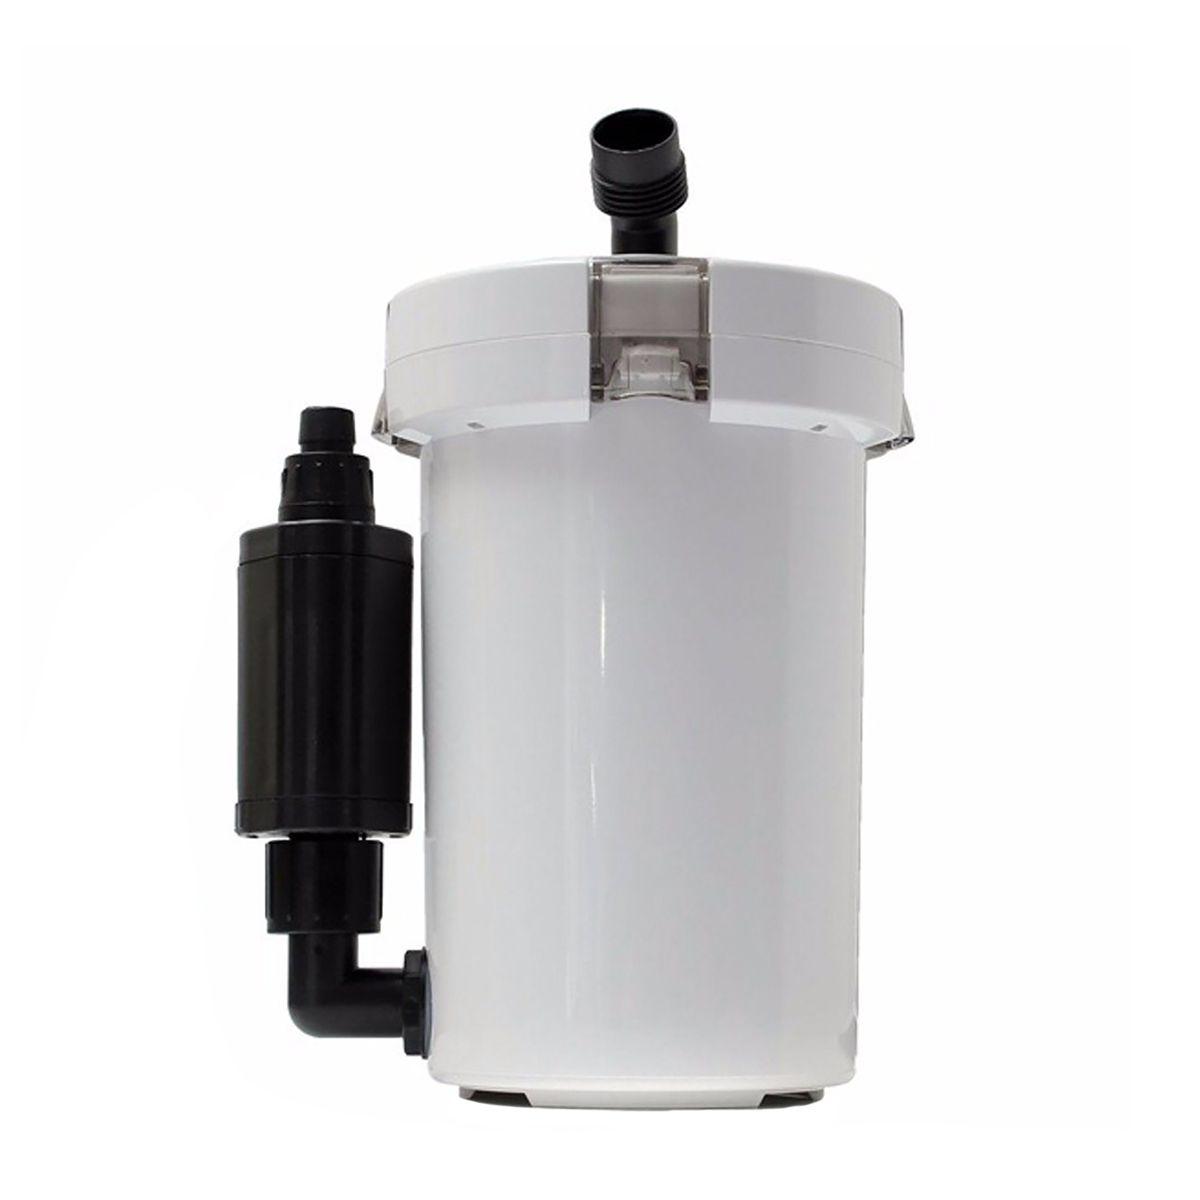 HW-602B MINI CANISTER 400L/H